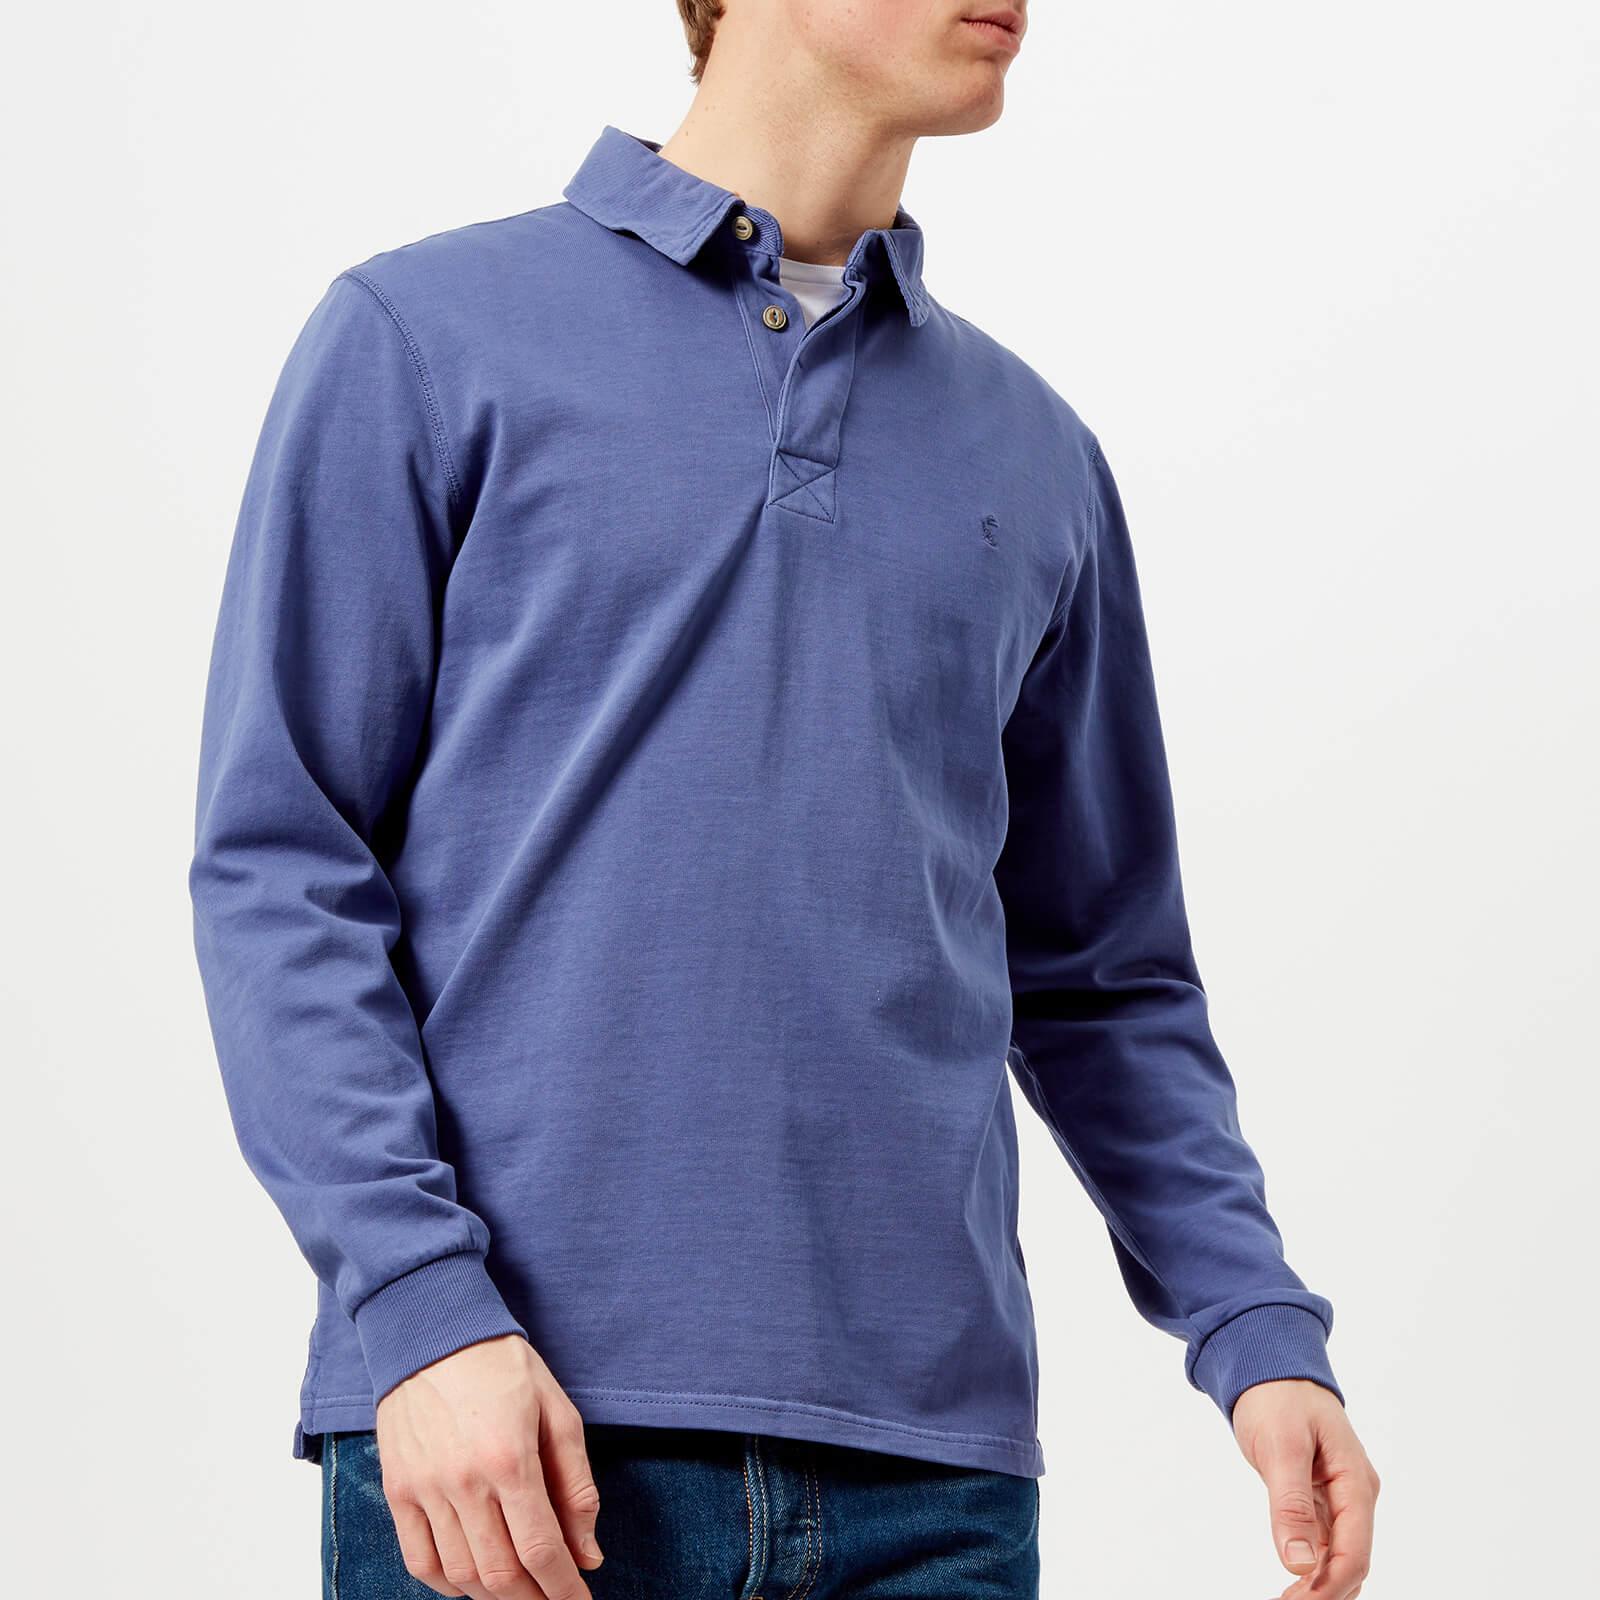 04014657150 Joules Men's Parkside Rugby Shirt - Skipper Blue Mens Clothing ...